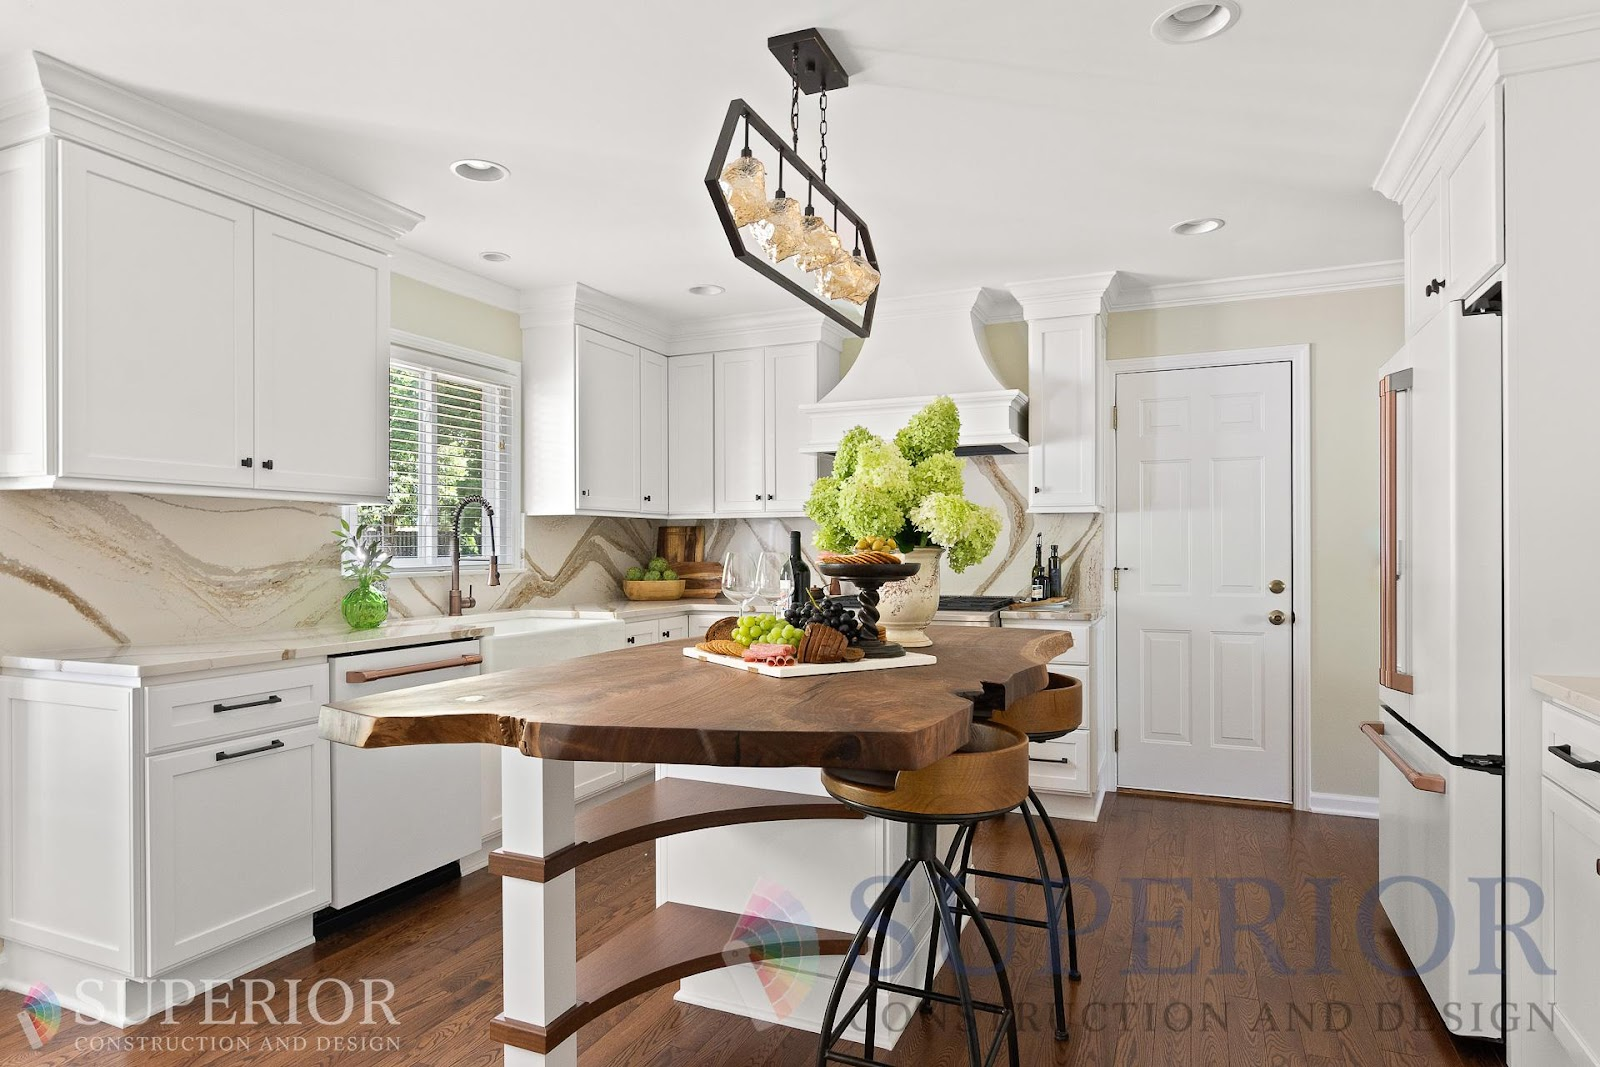 kitchen renovation plan cambria quartz lighting live edge walnut top budget mt juliet tn